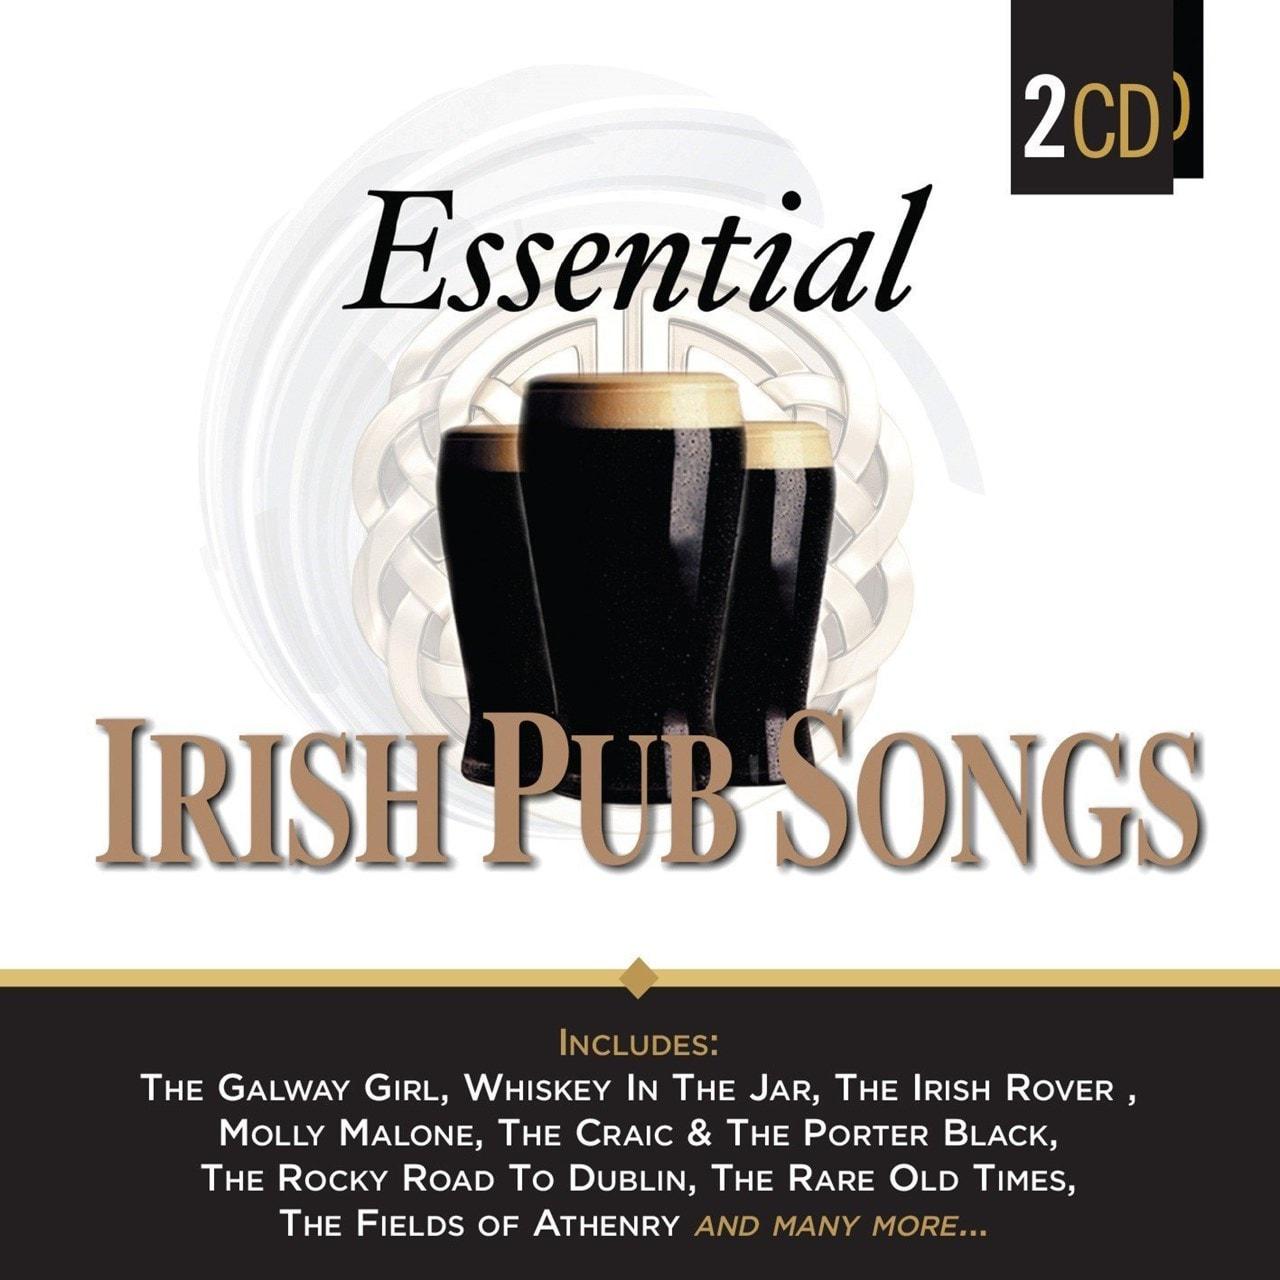 Essential Irish Pub Songs - 1